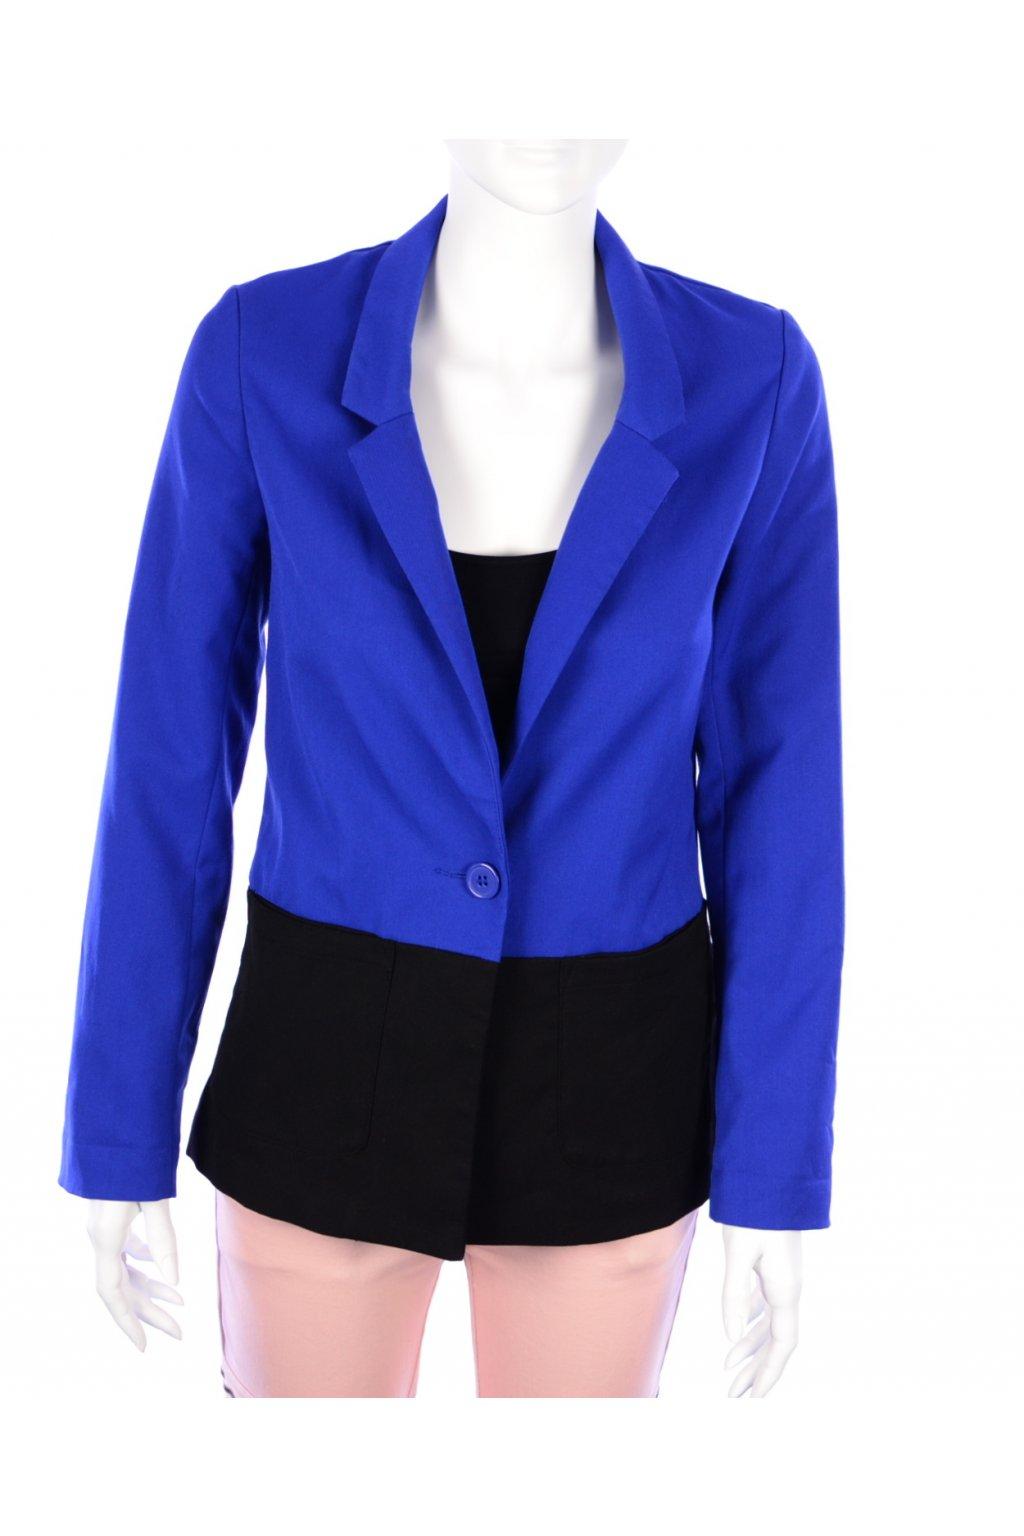 Sako modro-černé H&M vel. 34 / XS